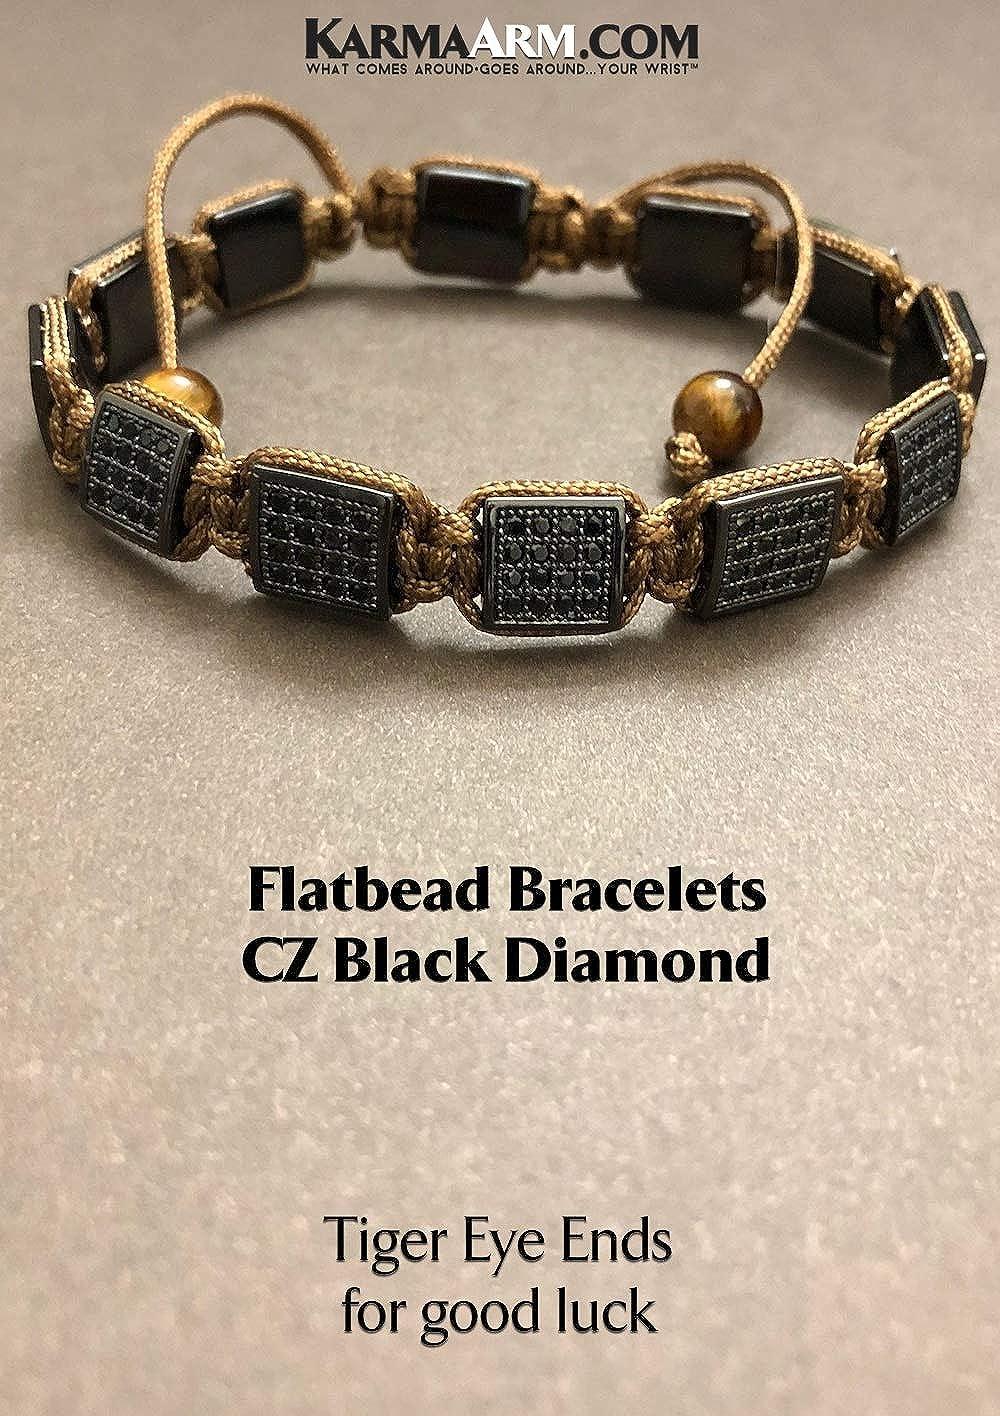 Bronze Cord KarmaArm Flat Bead Bracelets CZ Black Diamond Adjustable Yoga Reiki Chakra Boho Beaded Meditation FlatBead Mens Jewelry